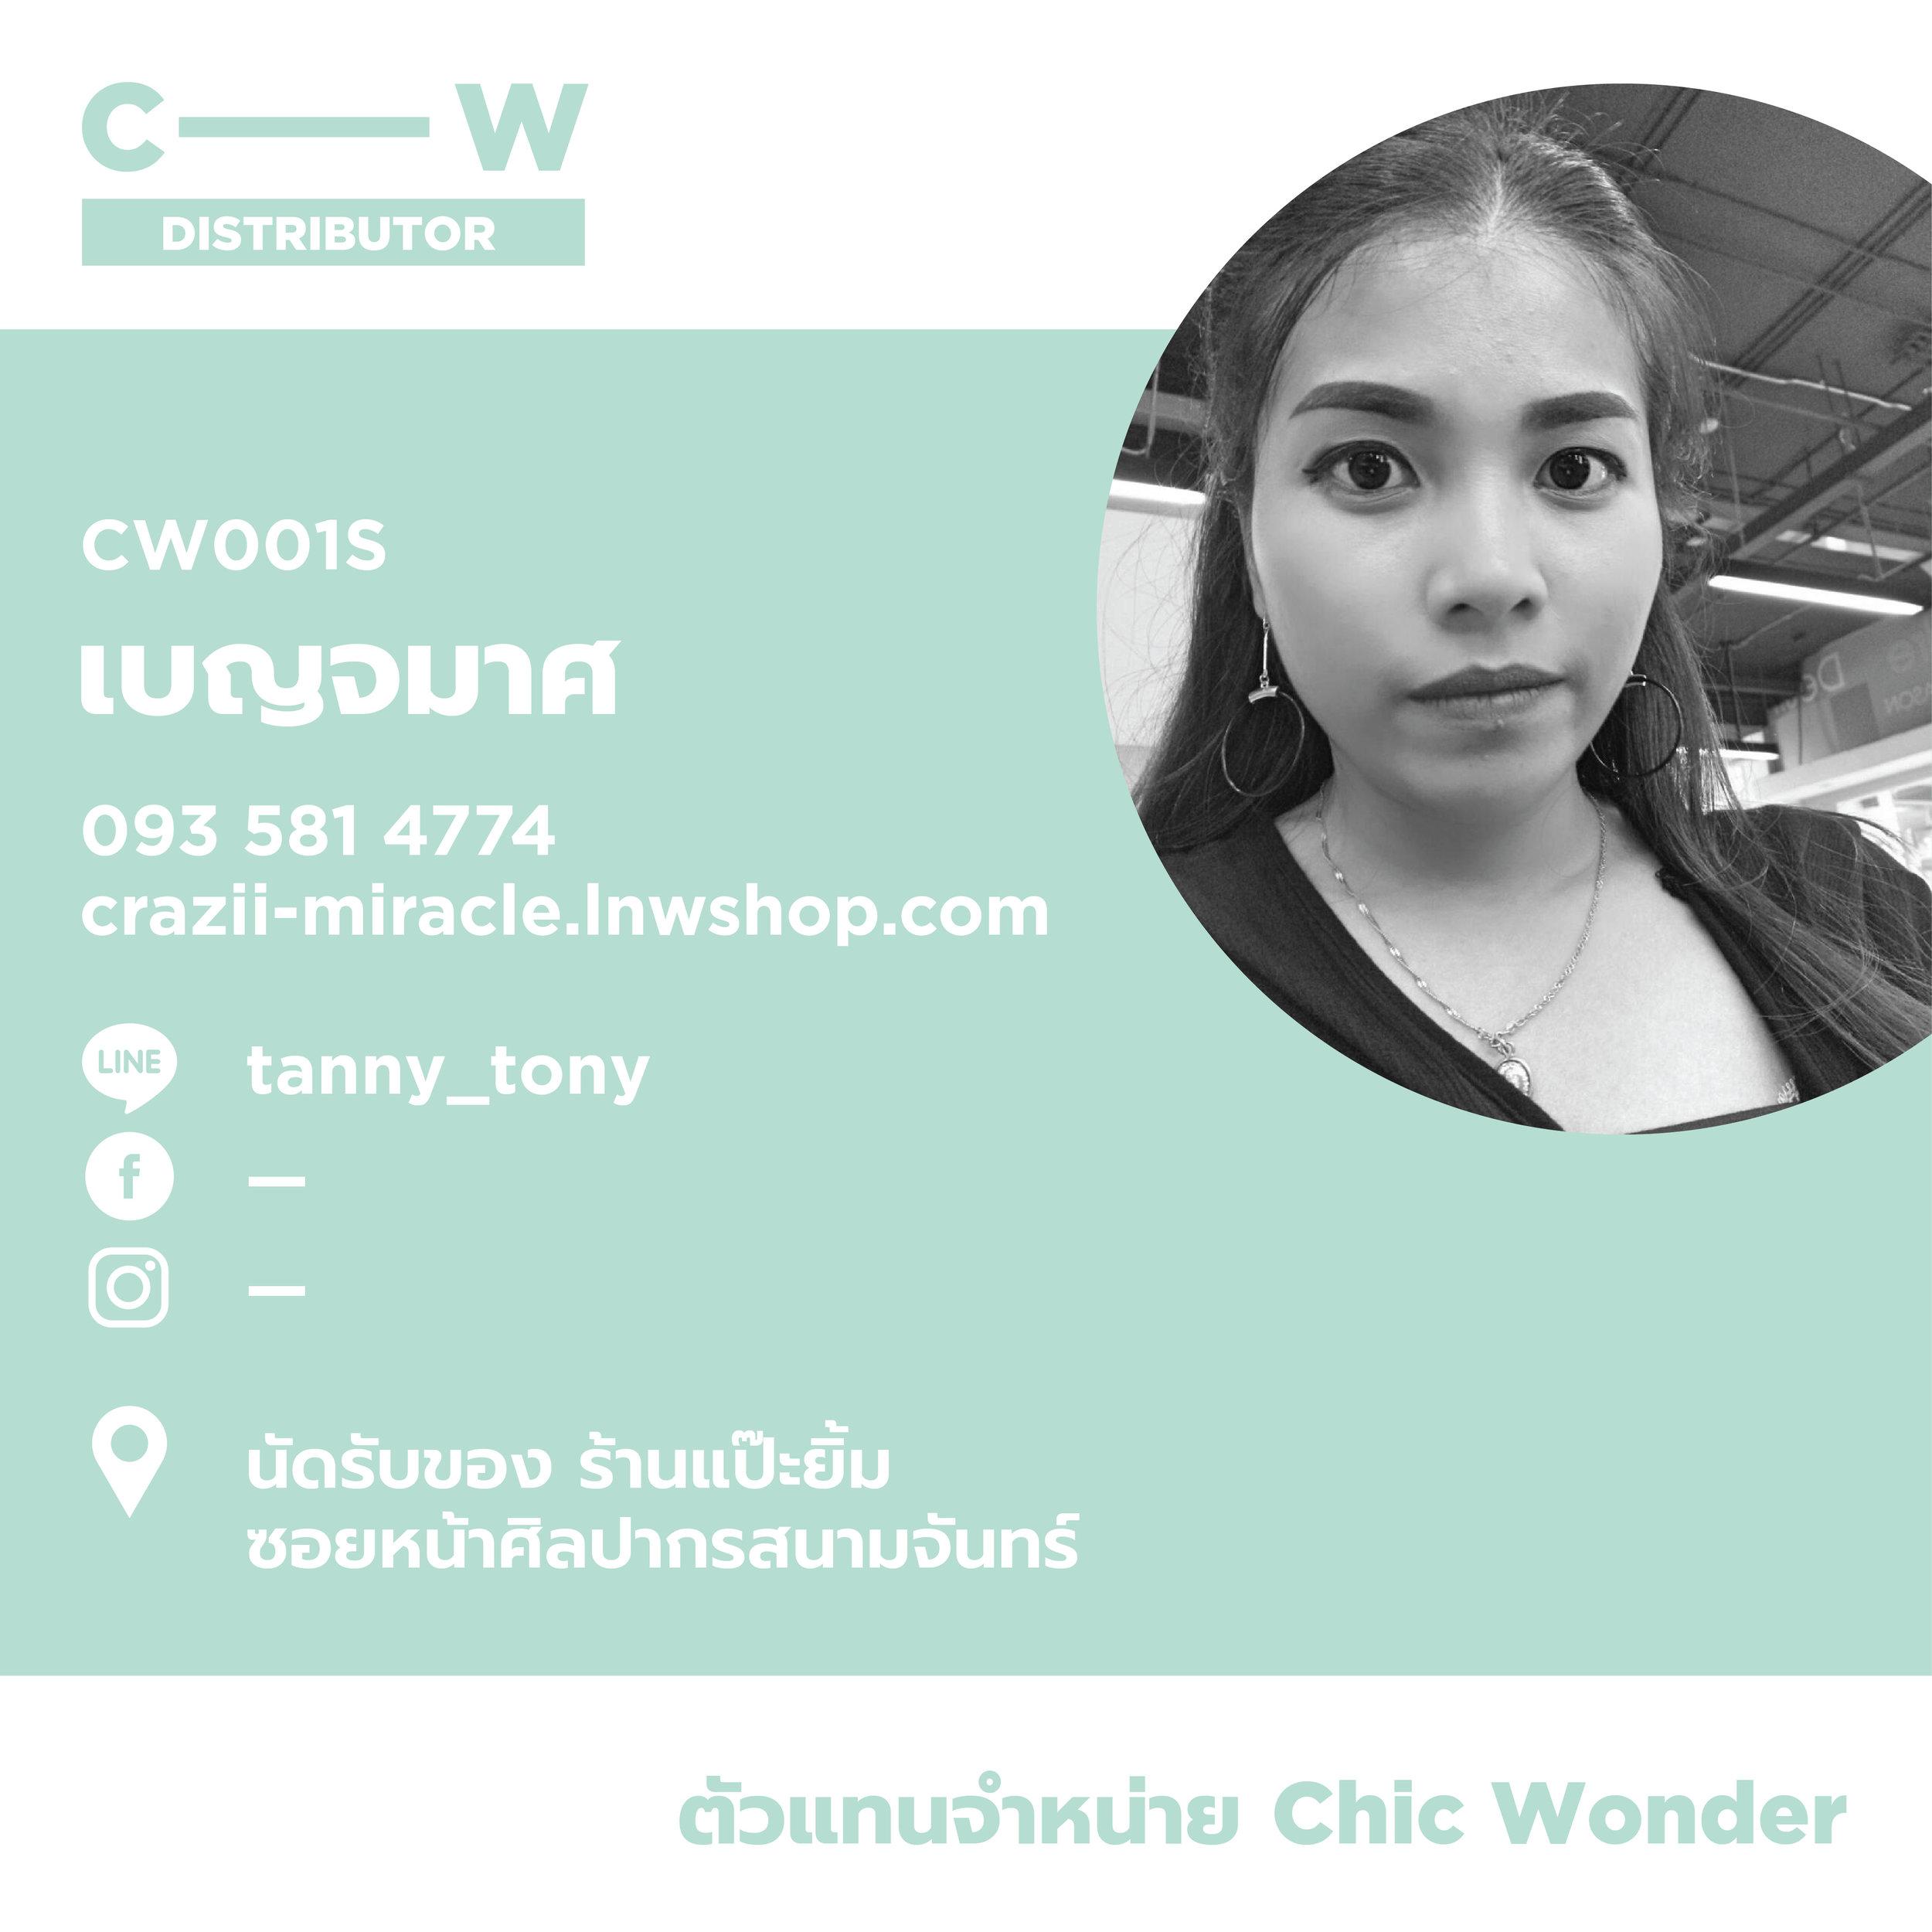 CW_DistributorProfiles-01.jpg